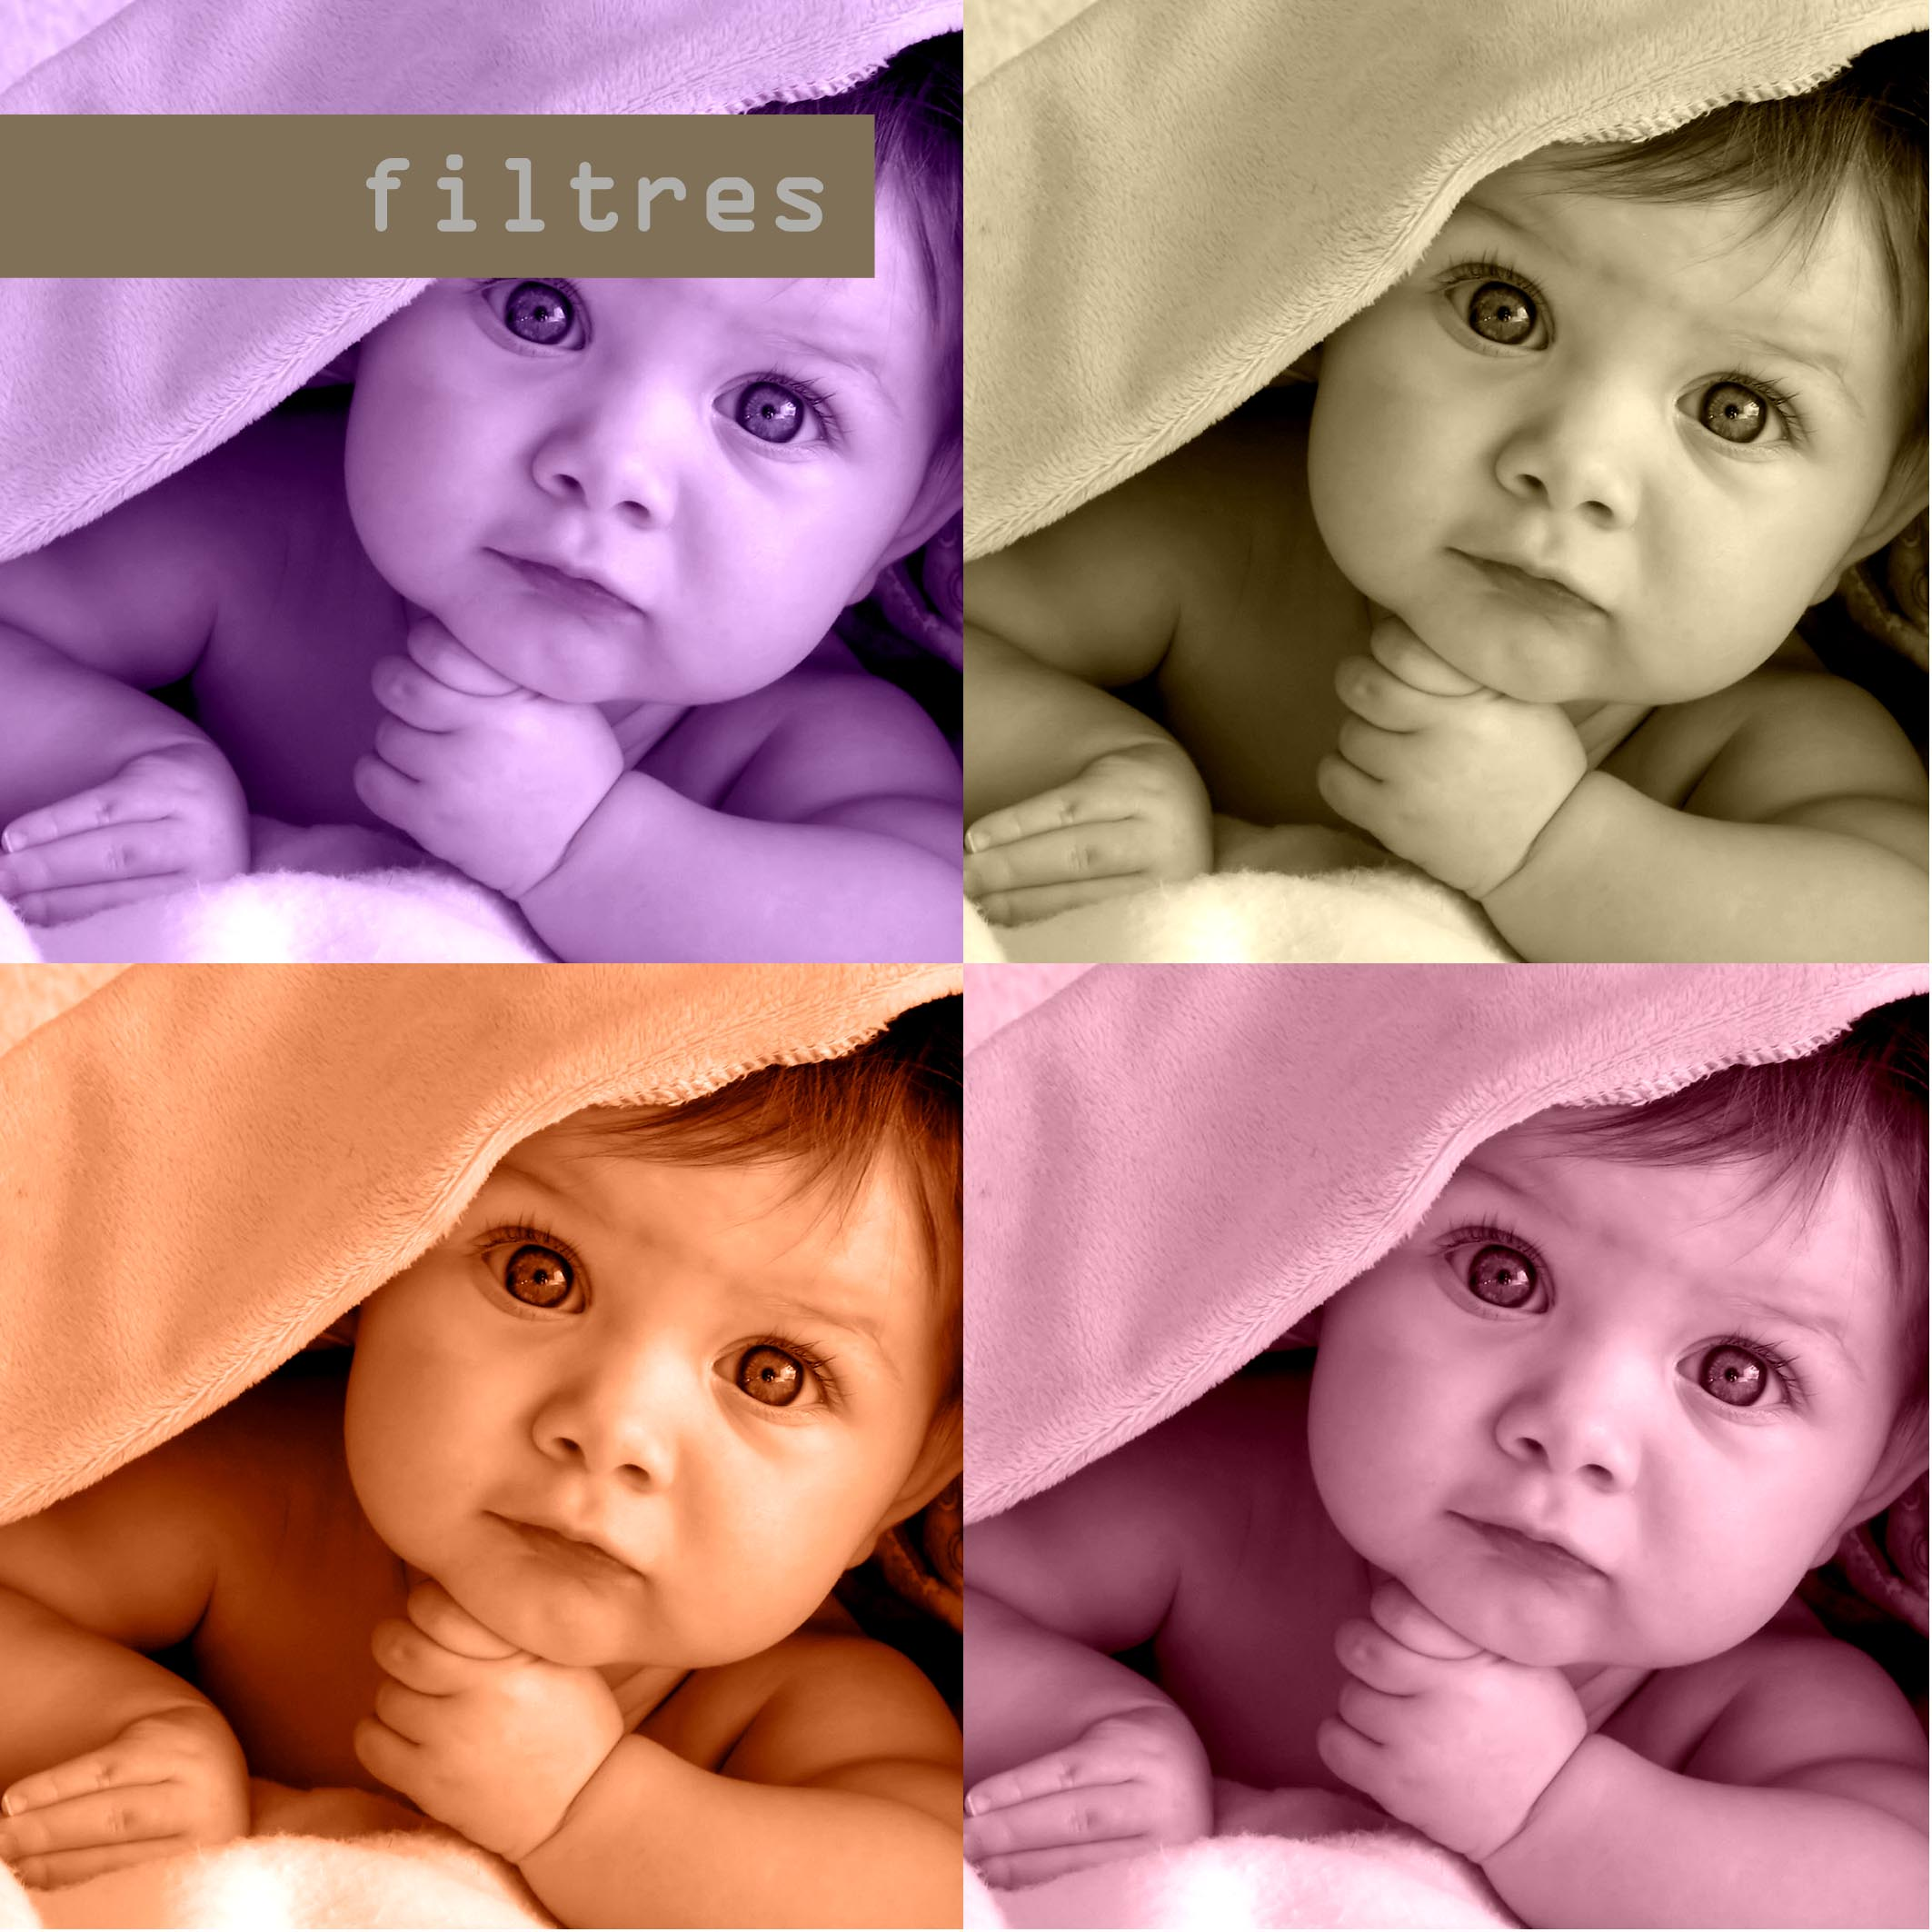 sitephotofiltres.jpg